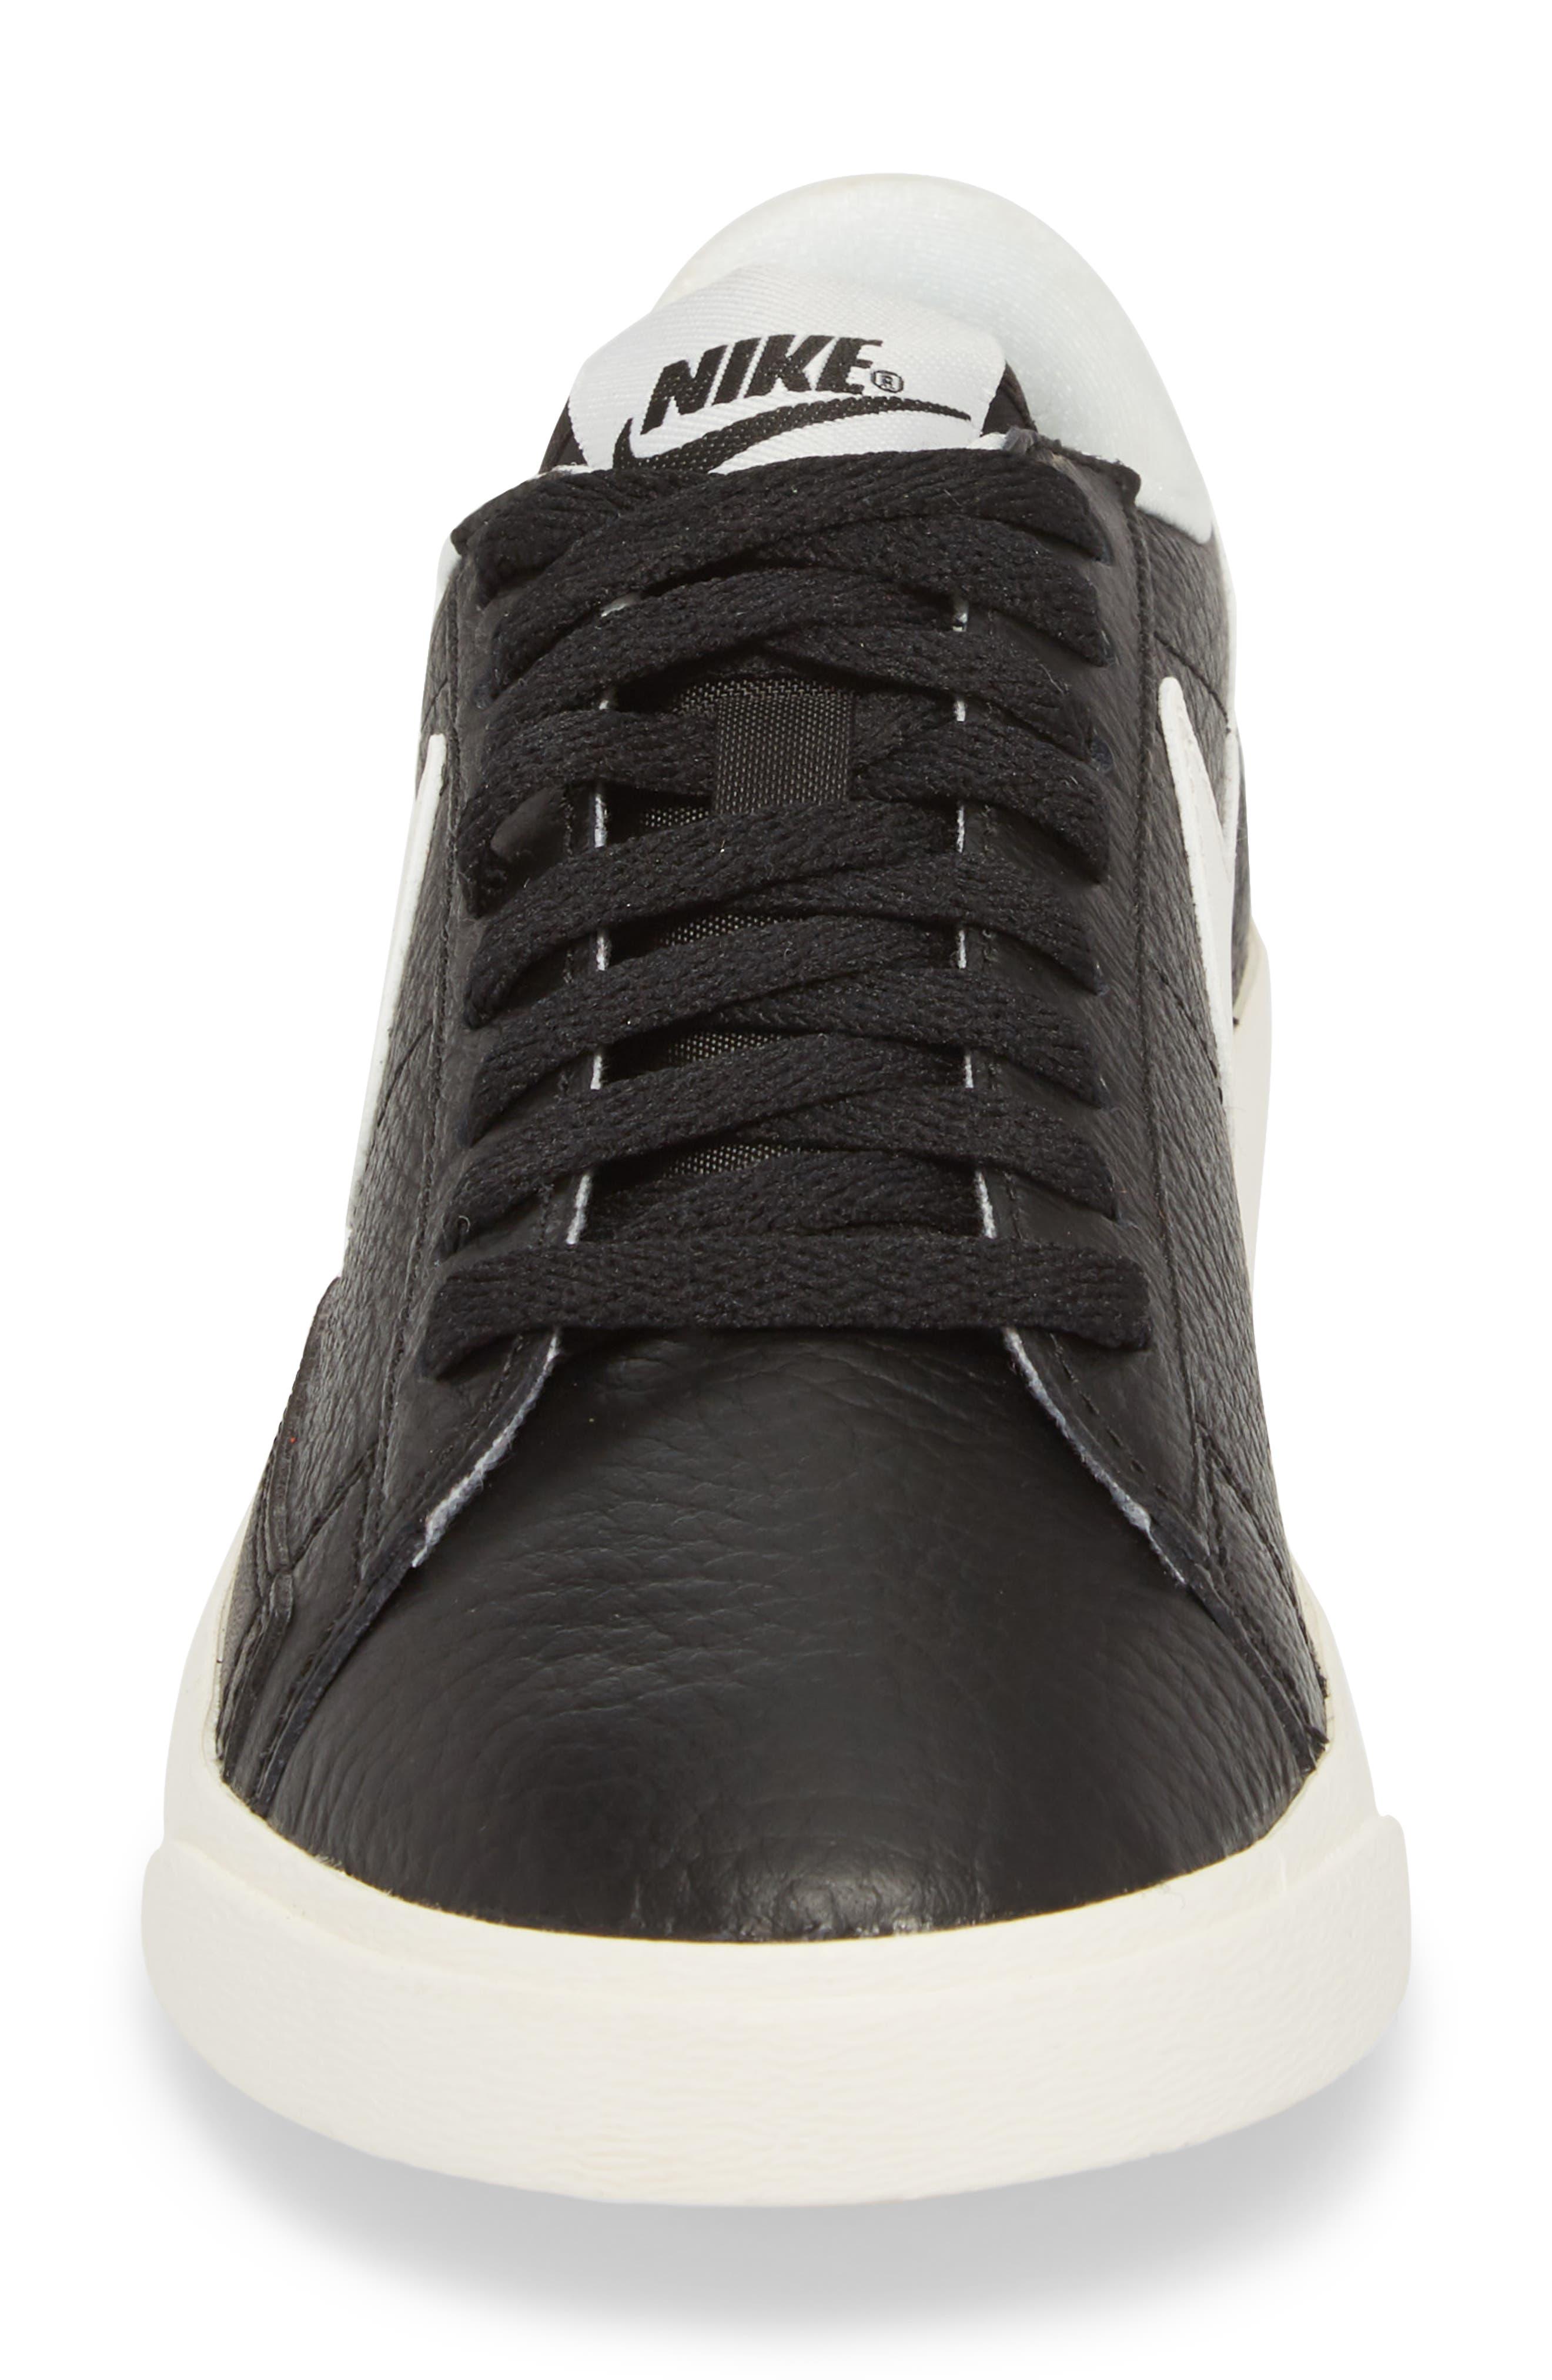 Blazer Premium Low Sneaker,                             Alternate thumbnail 4, color,                             Black/ White/ Black